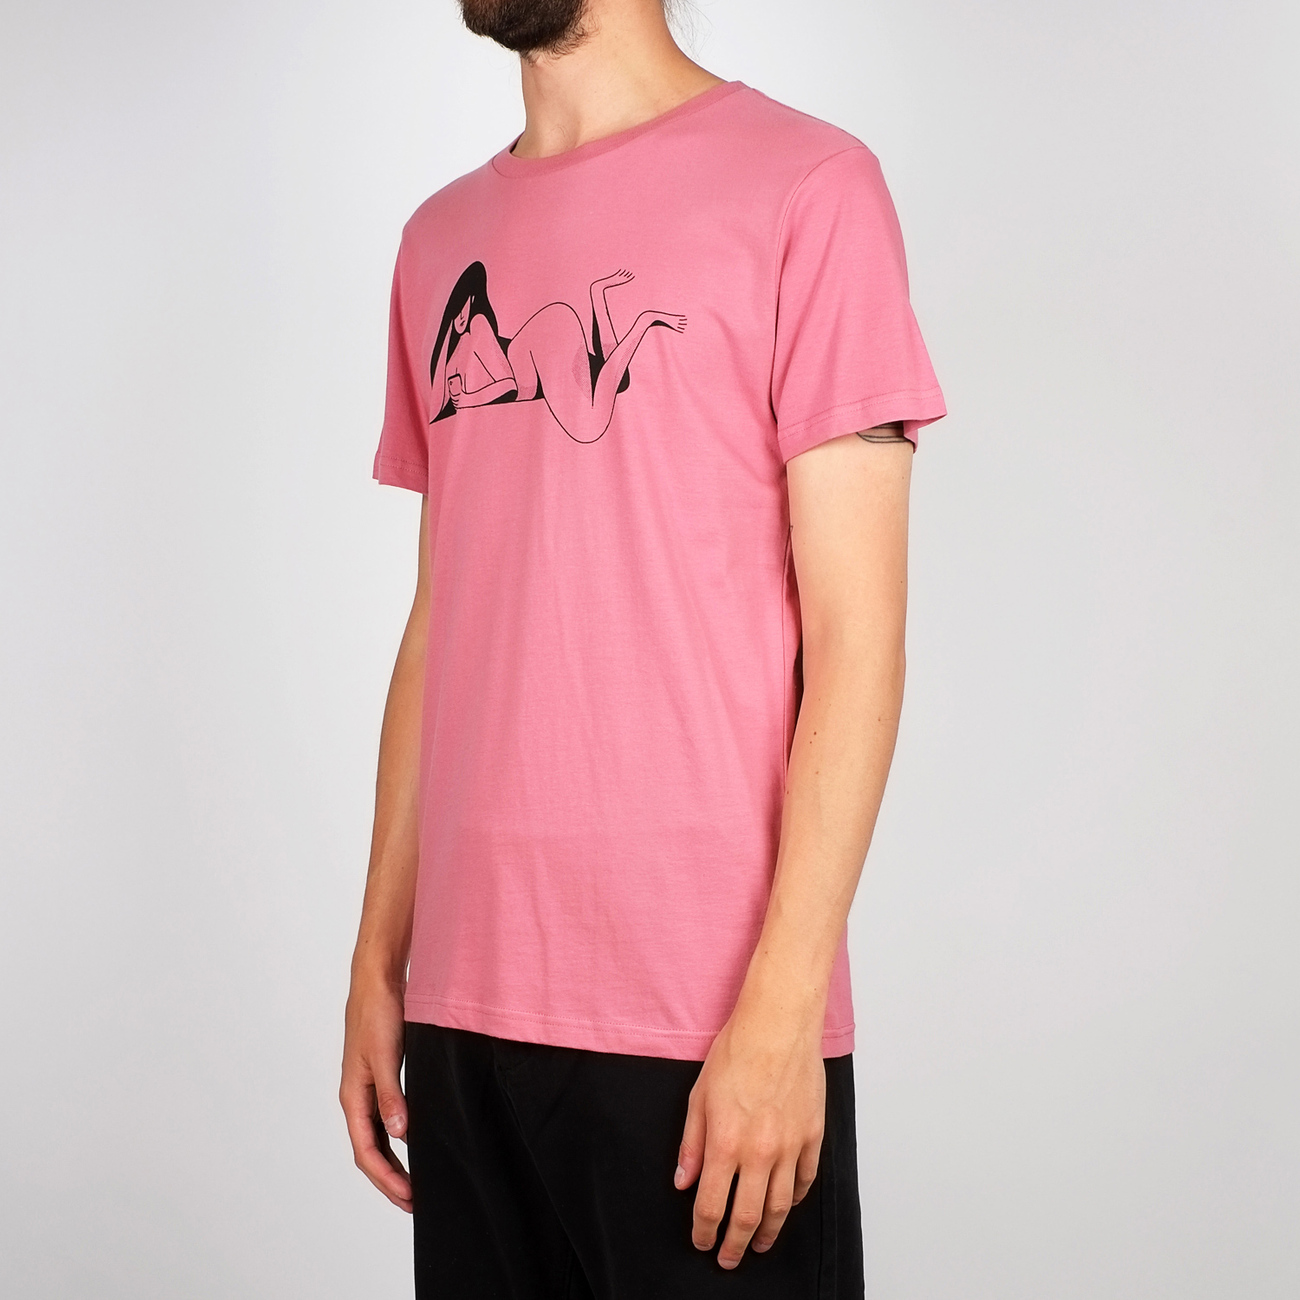 T-shirt Stockholm Phoning